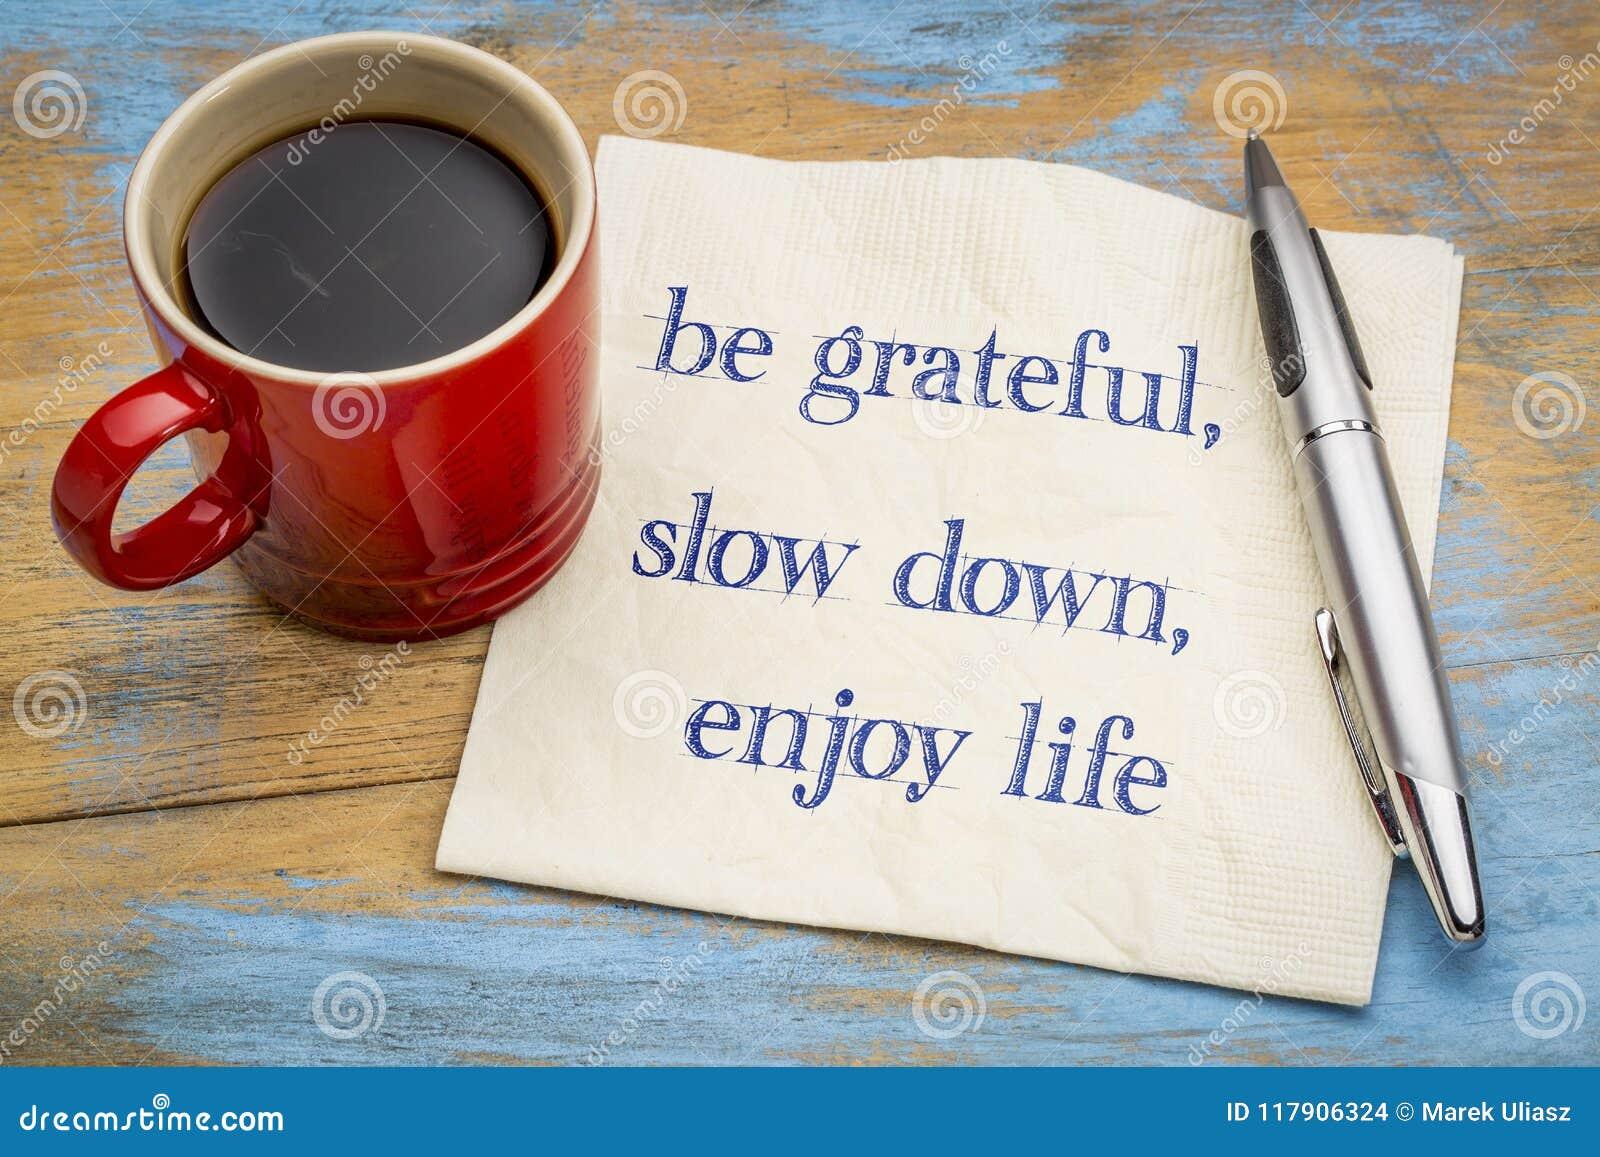 Be grateful, slow down, enjoy life